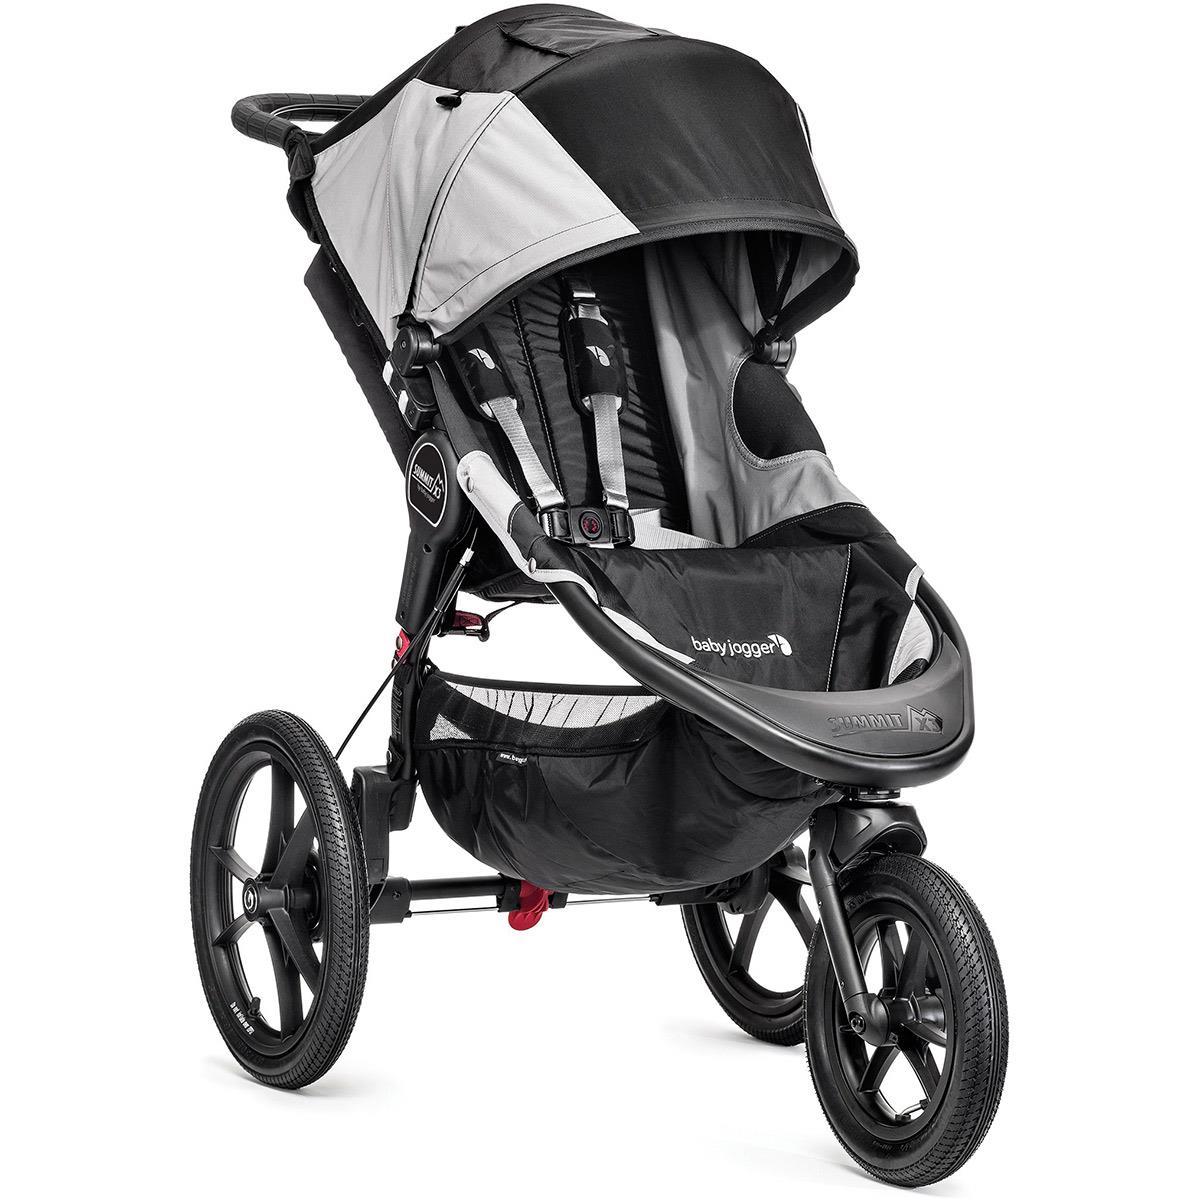 Wózek Summit X3 firmy Baby Jogger